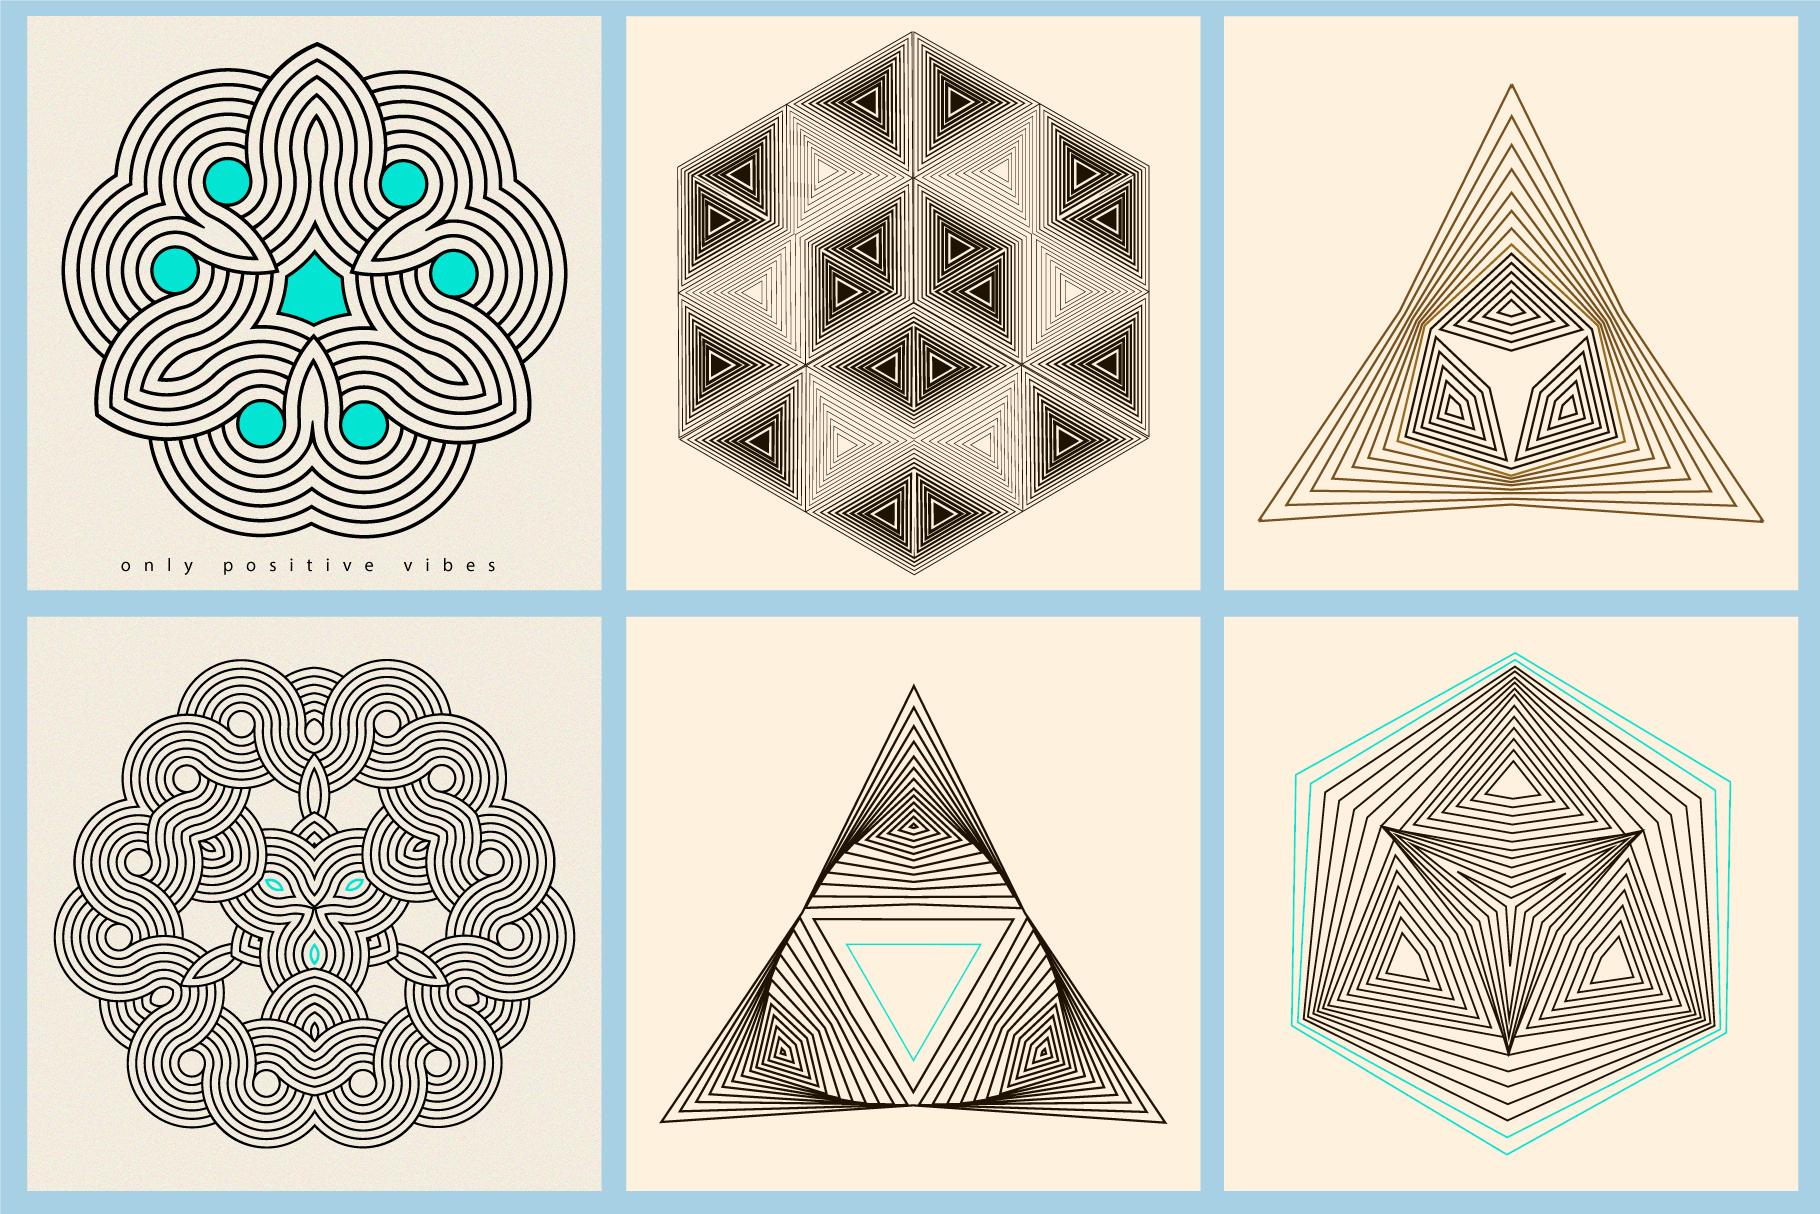 Illusion linear geometric shapes example image 10